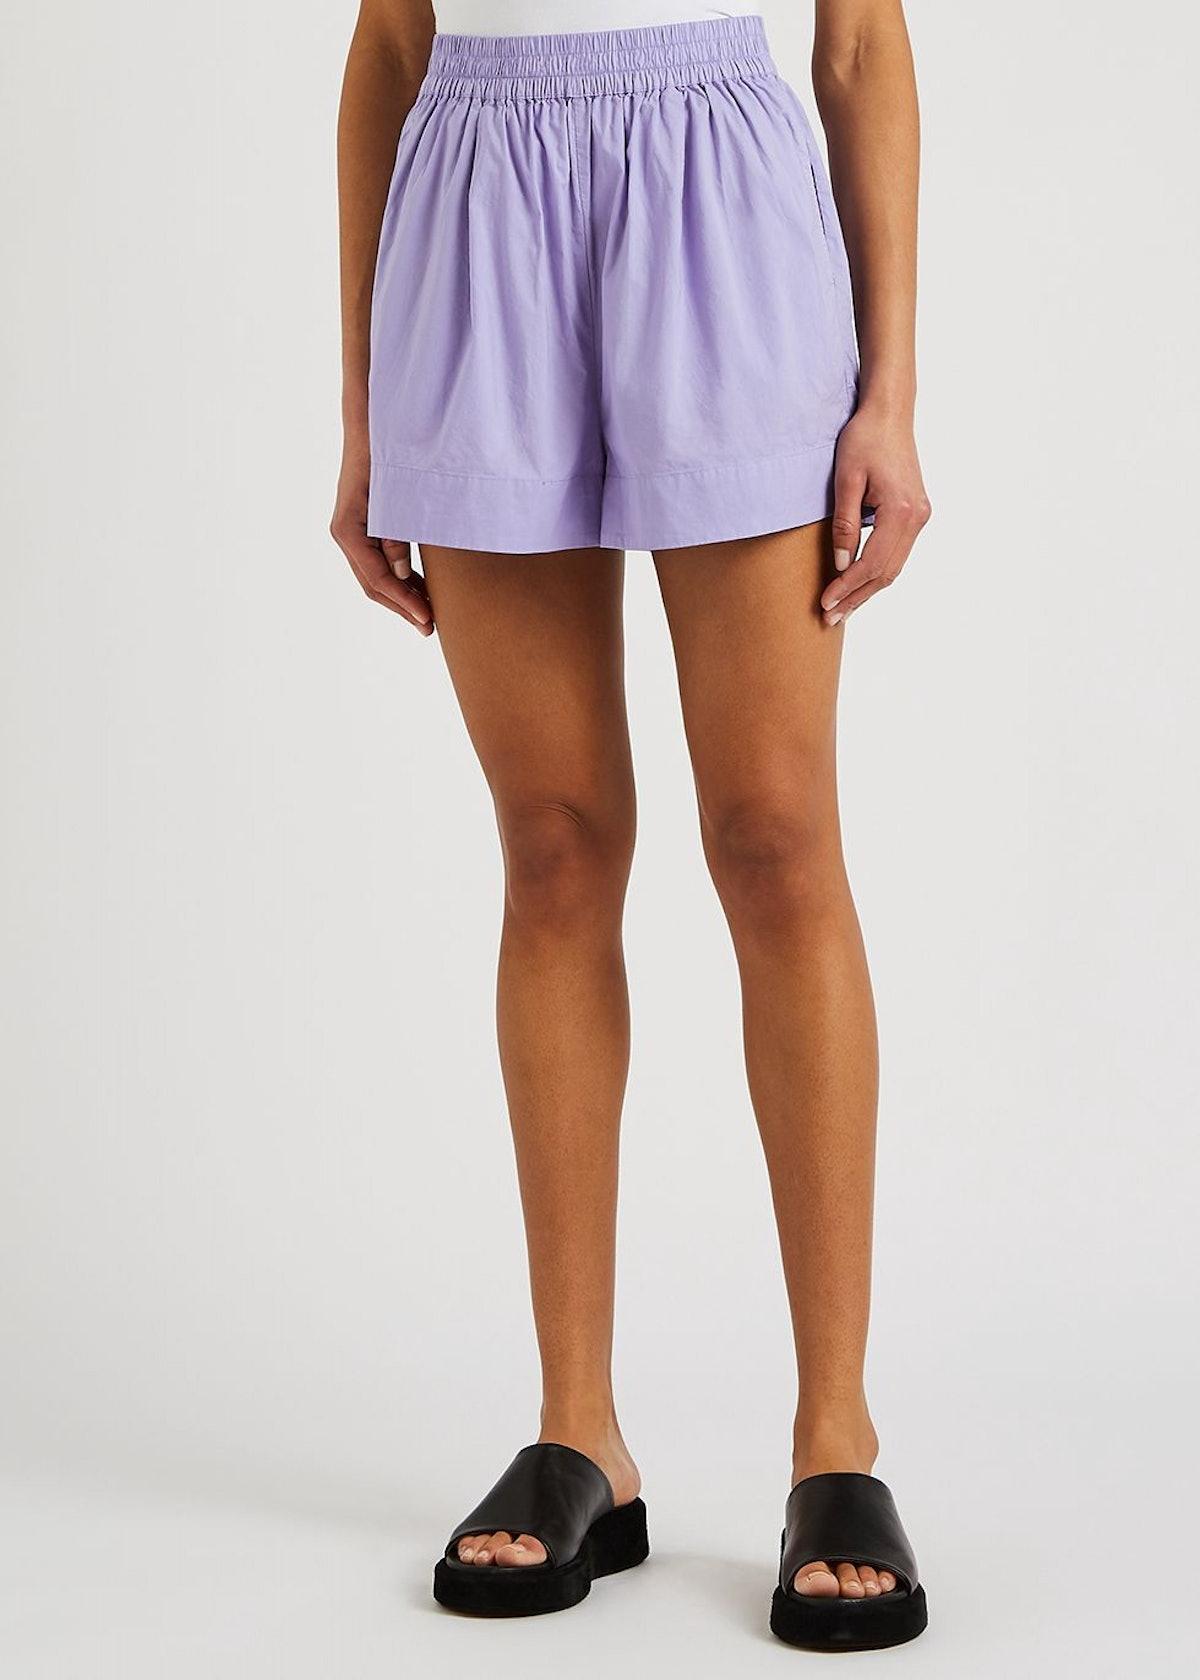 Chiara purple cotton shorts: image 1